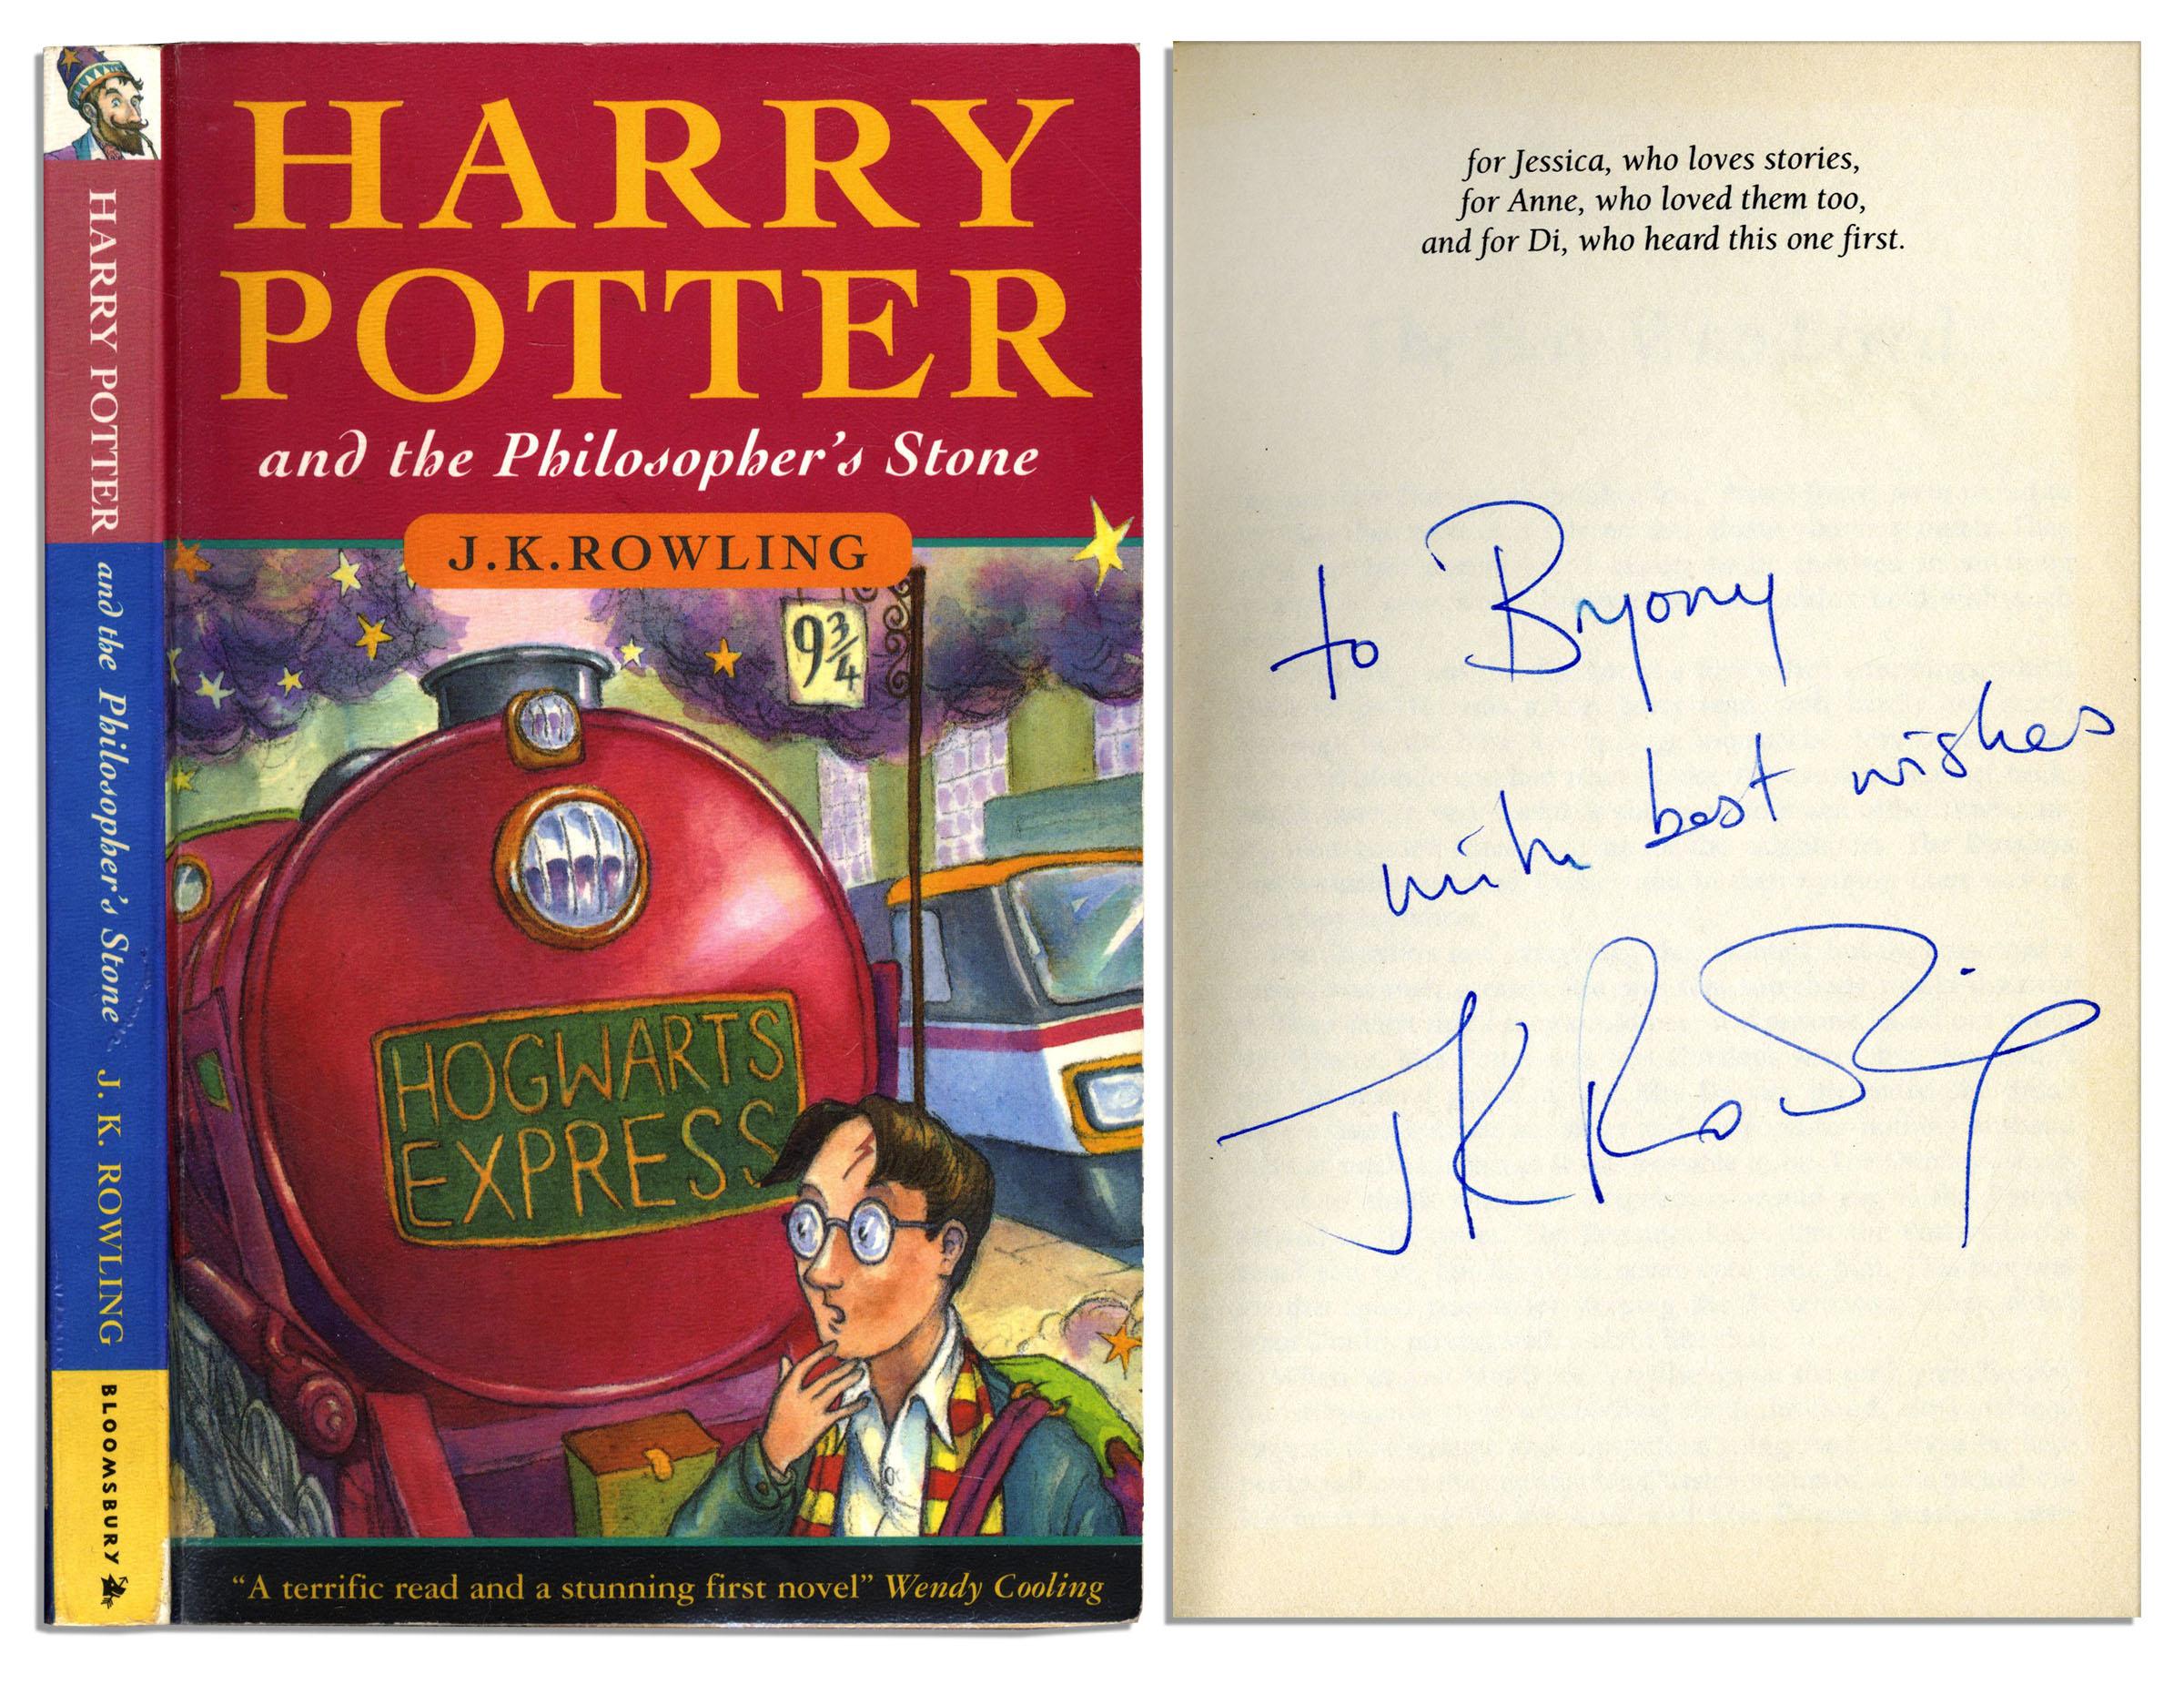 Resultado de imagem para Harry Potter and the Philosopher's Stone first book Harry Potter and the Philosopher's Stone Discover 124k rare book of 'Harry Potter and the Philosopher's Stone' 38841 lg